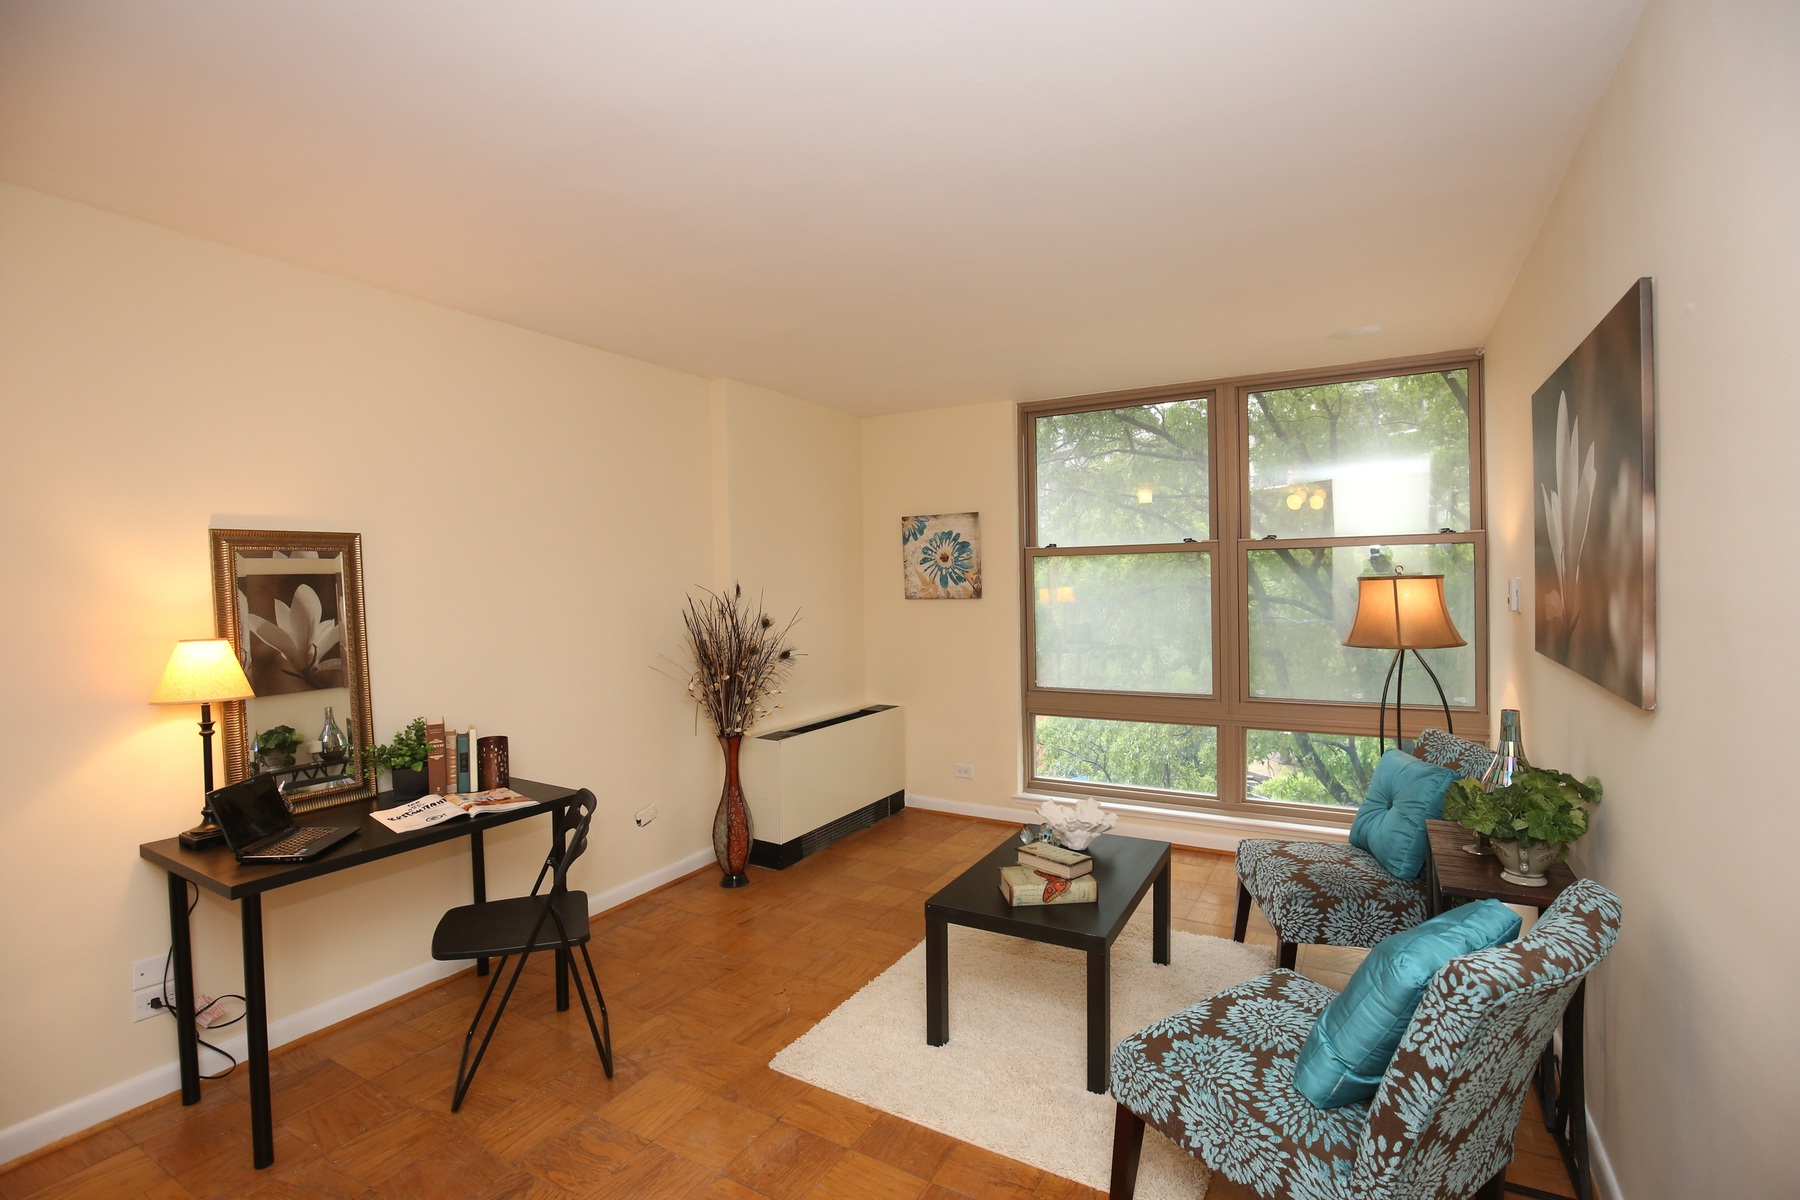 sales property at 1260 21st Street Nw 602, Washington